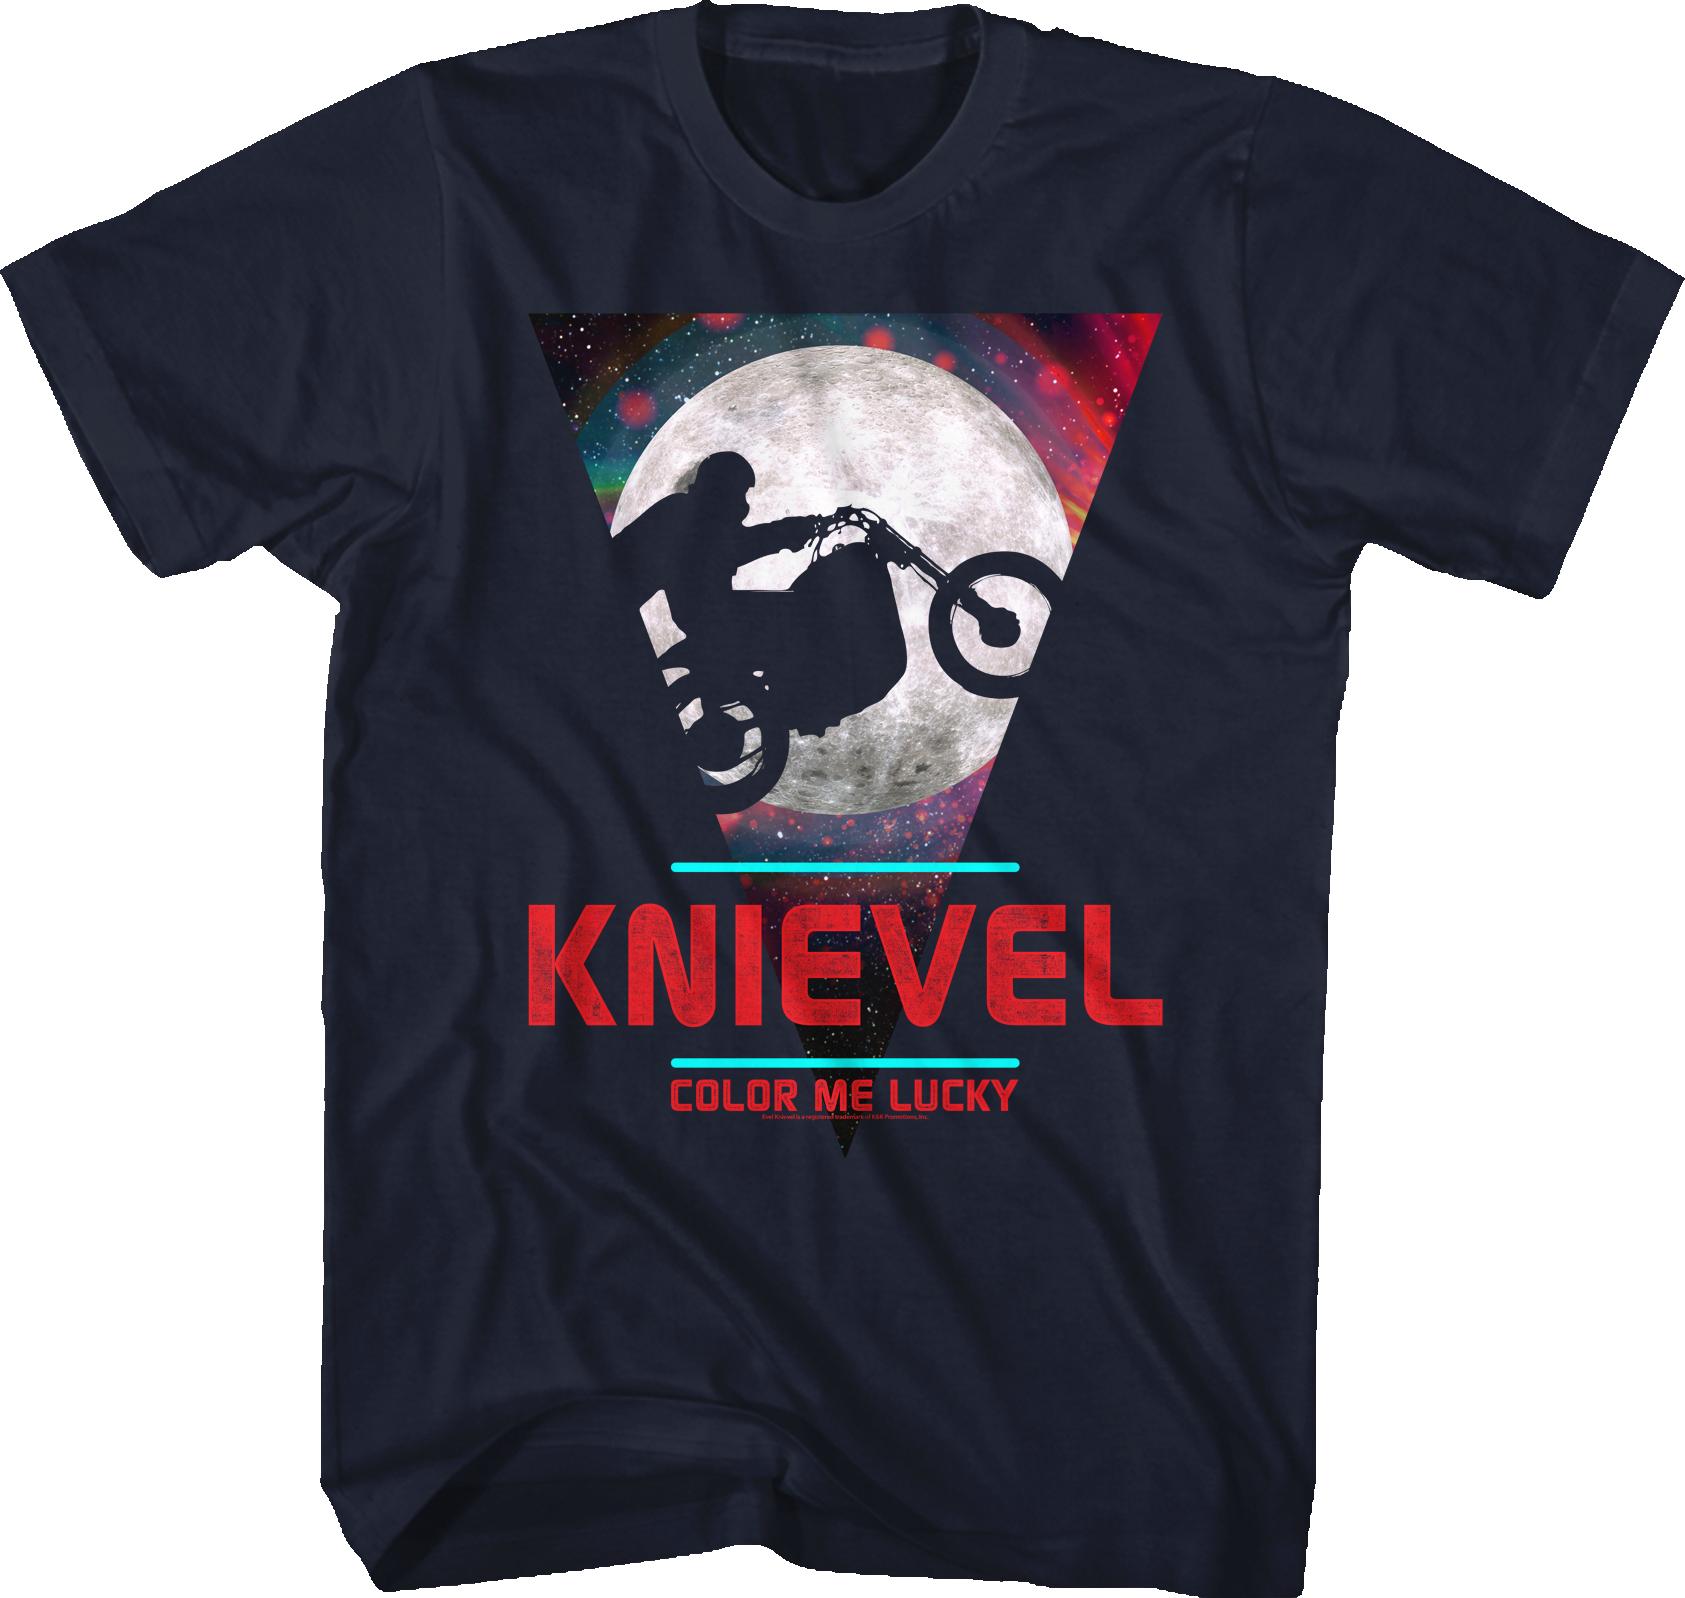 Evel Knievel T-SHIRT stunt motorbike daredevil Movie Ninja